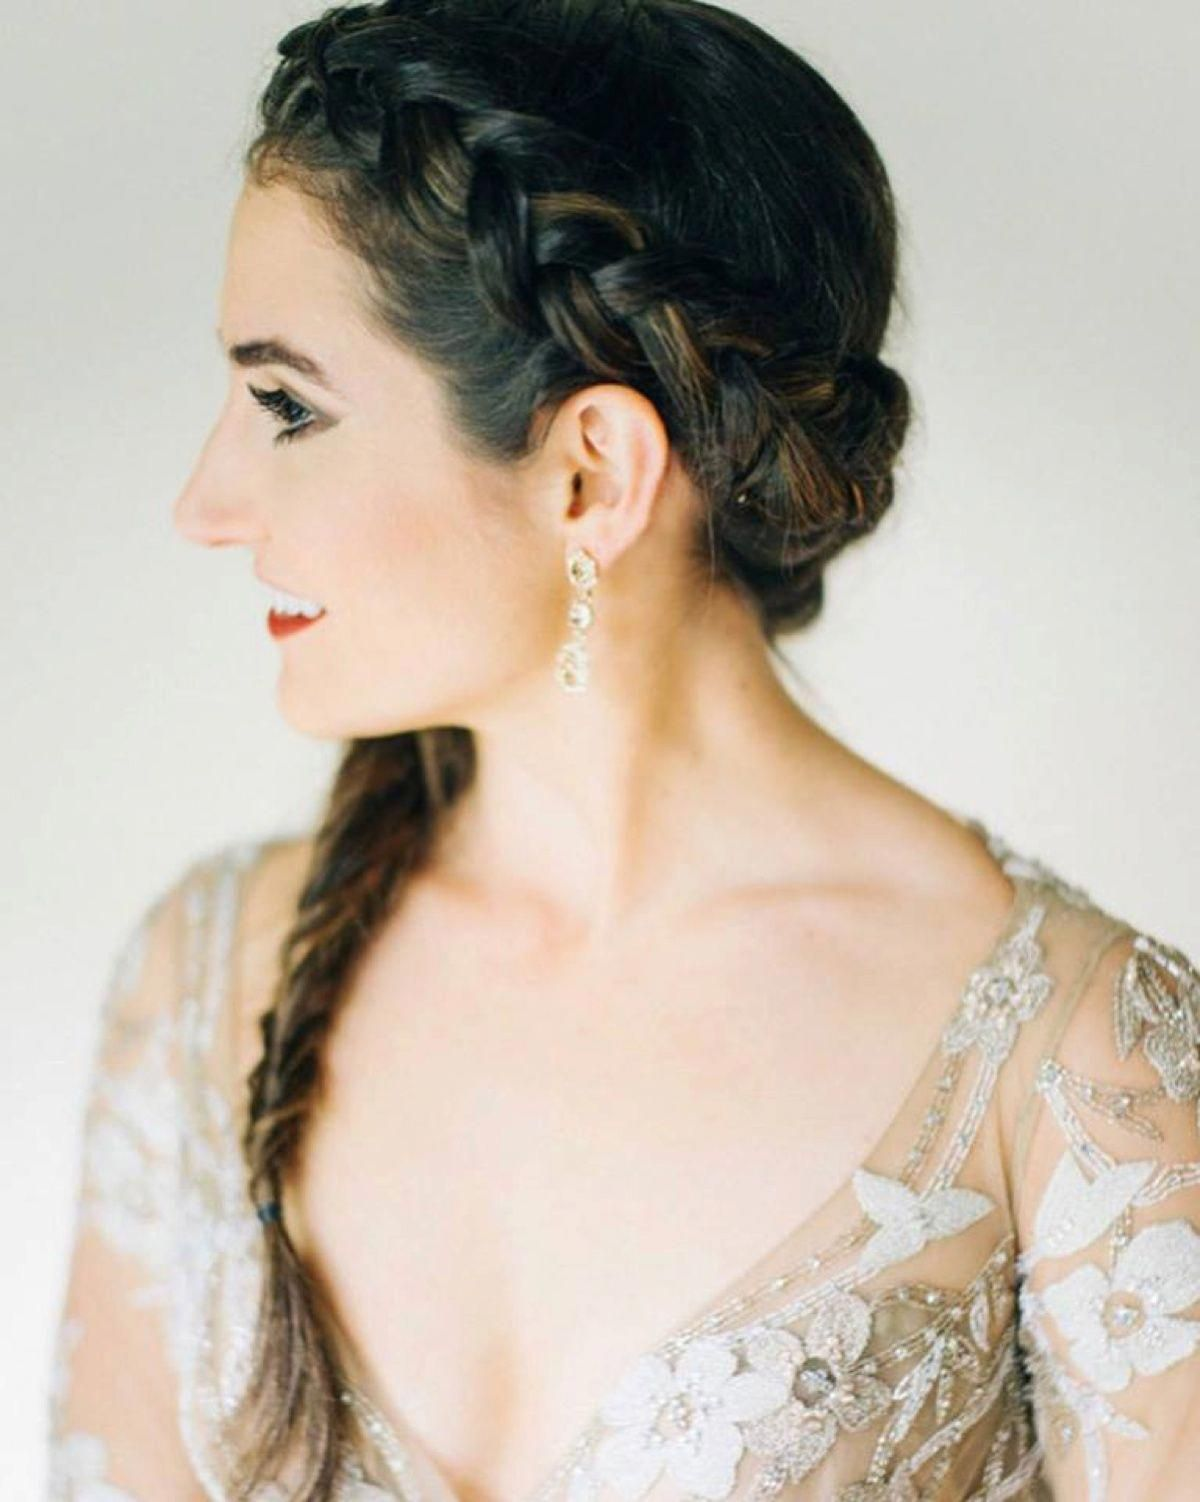 wedding hair & makeup inspiration: 7 stunning looks from jl